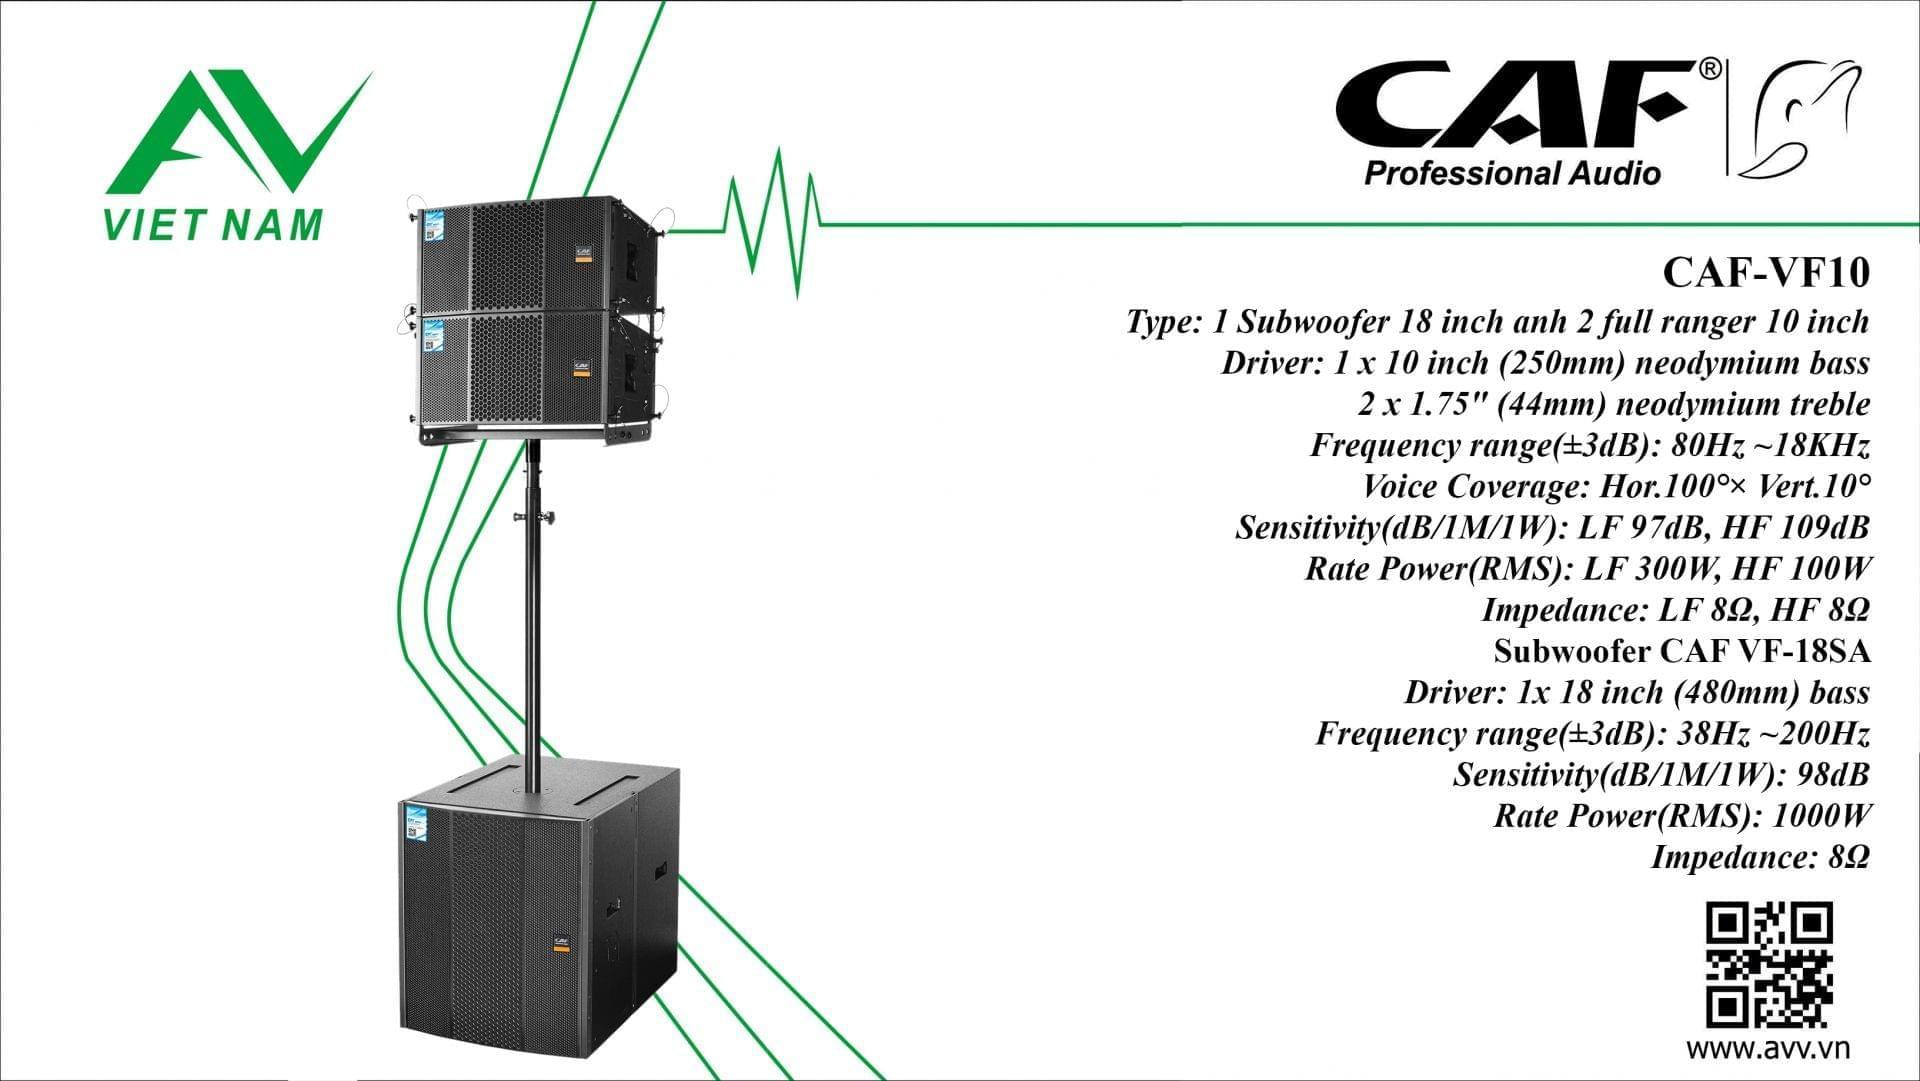 caf-vf-10-avv.jpg